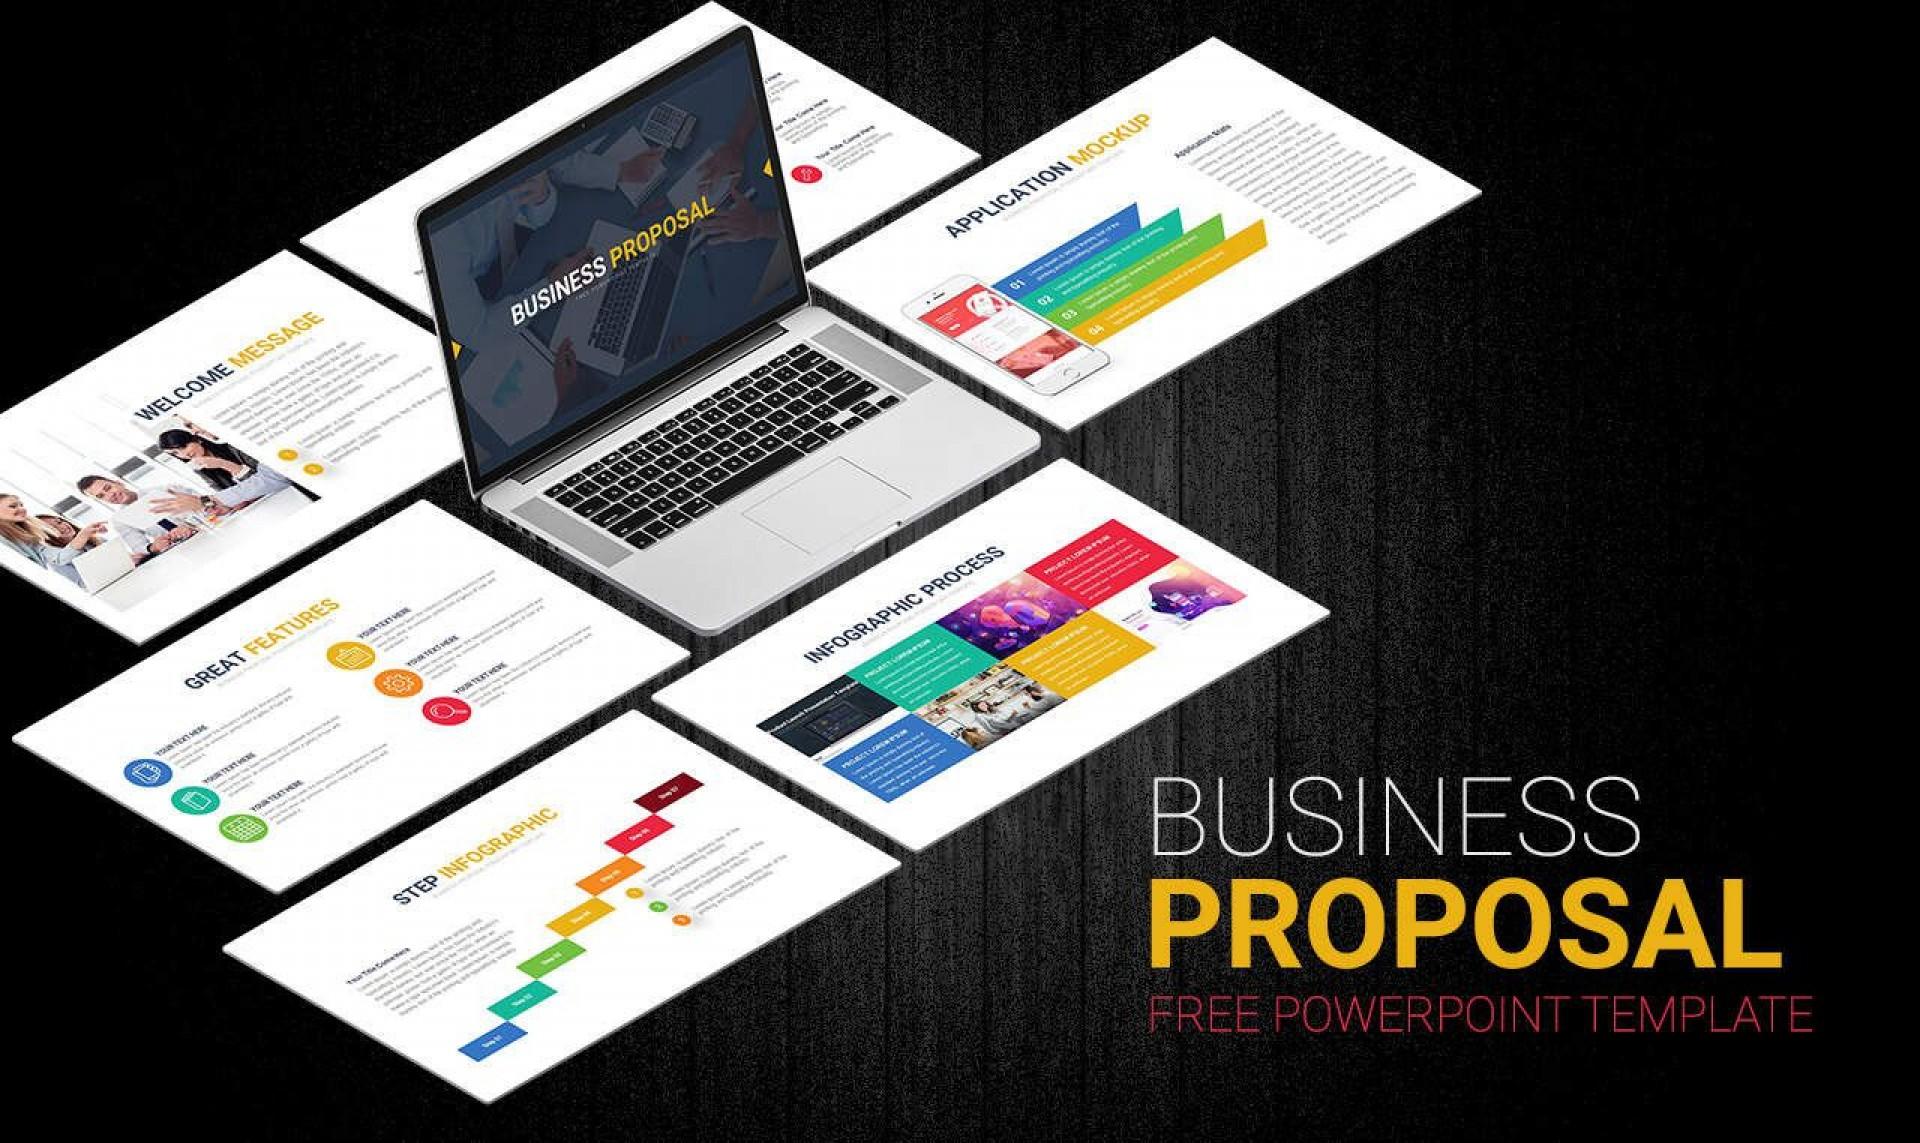 008 Astounding Free Download Busines Proposal Template Ppt High Resolution  Best Plan Sample Plan.ppt 20201920